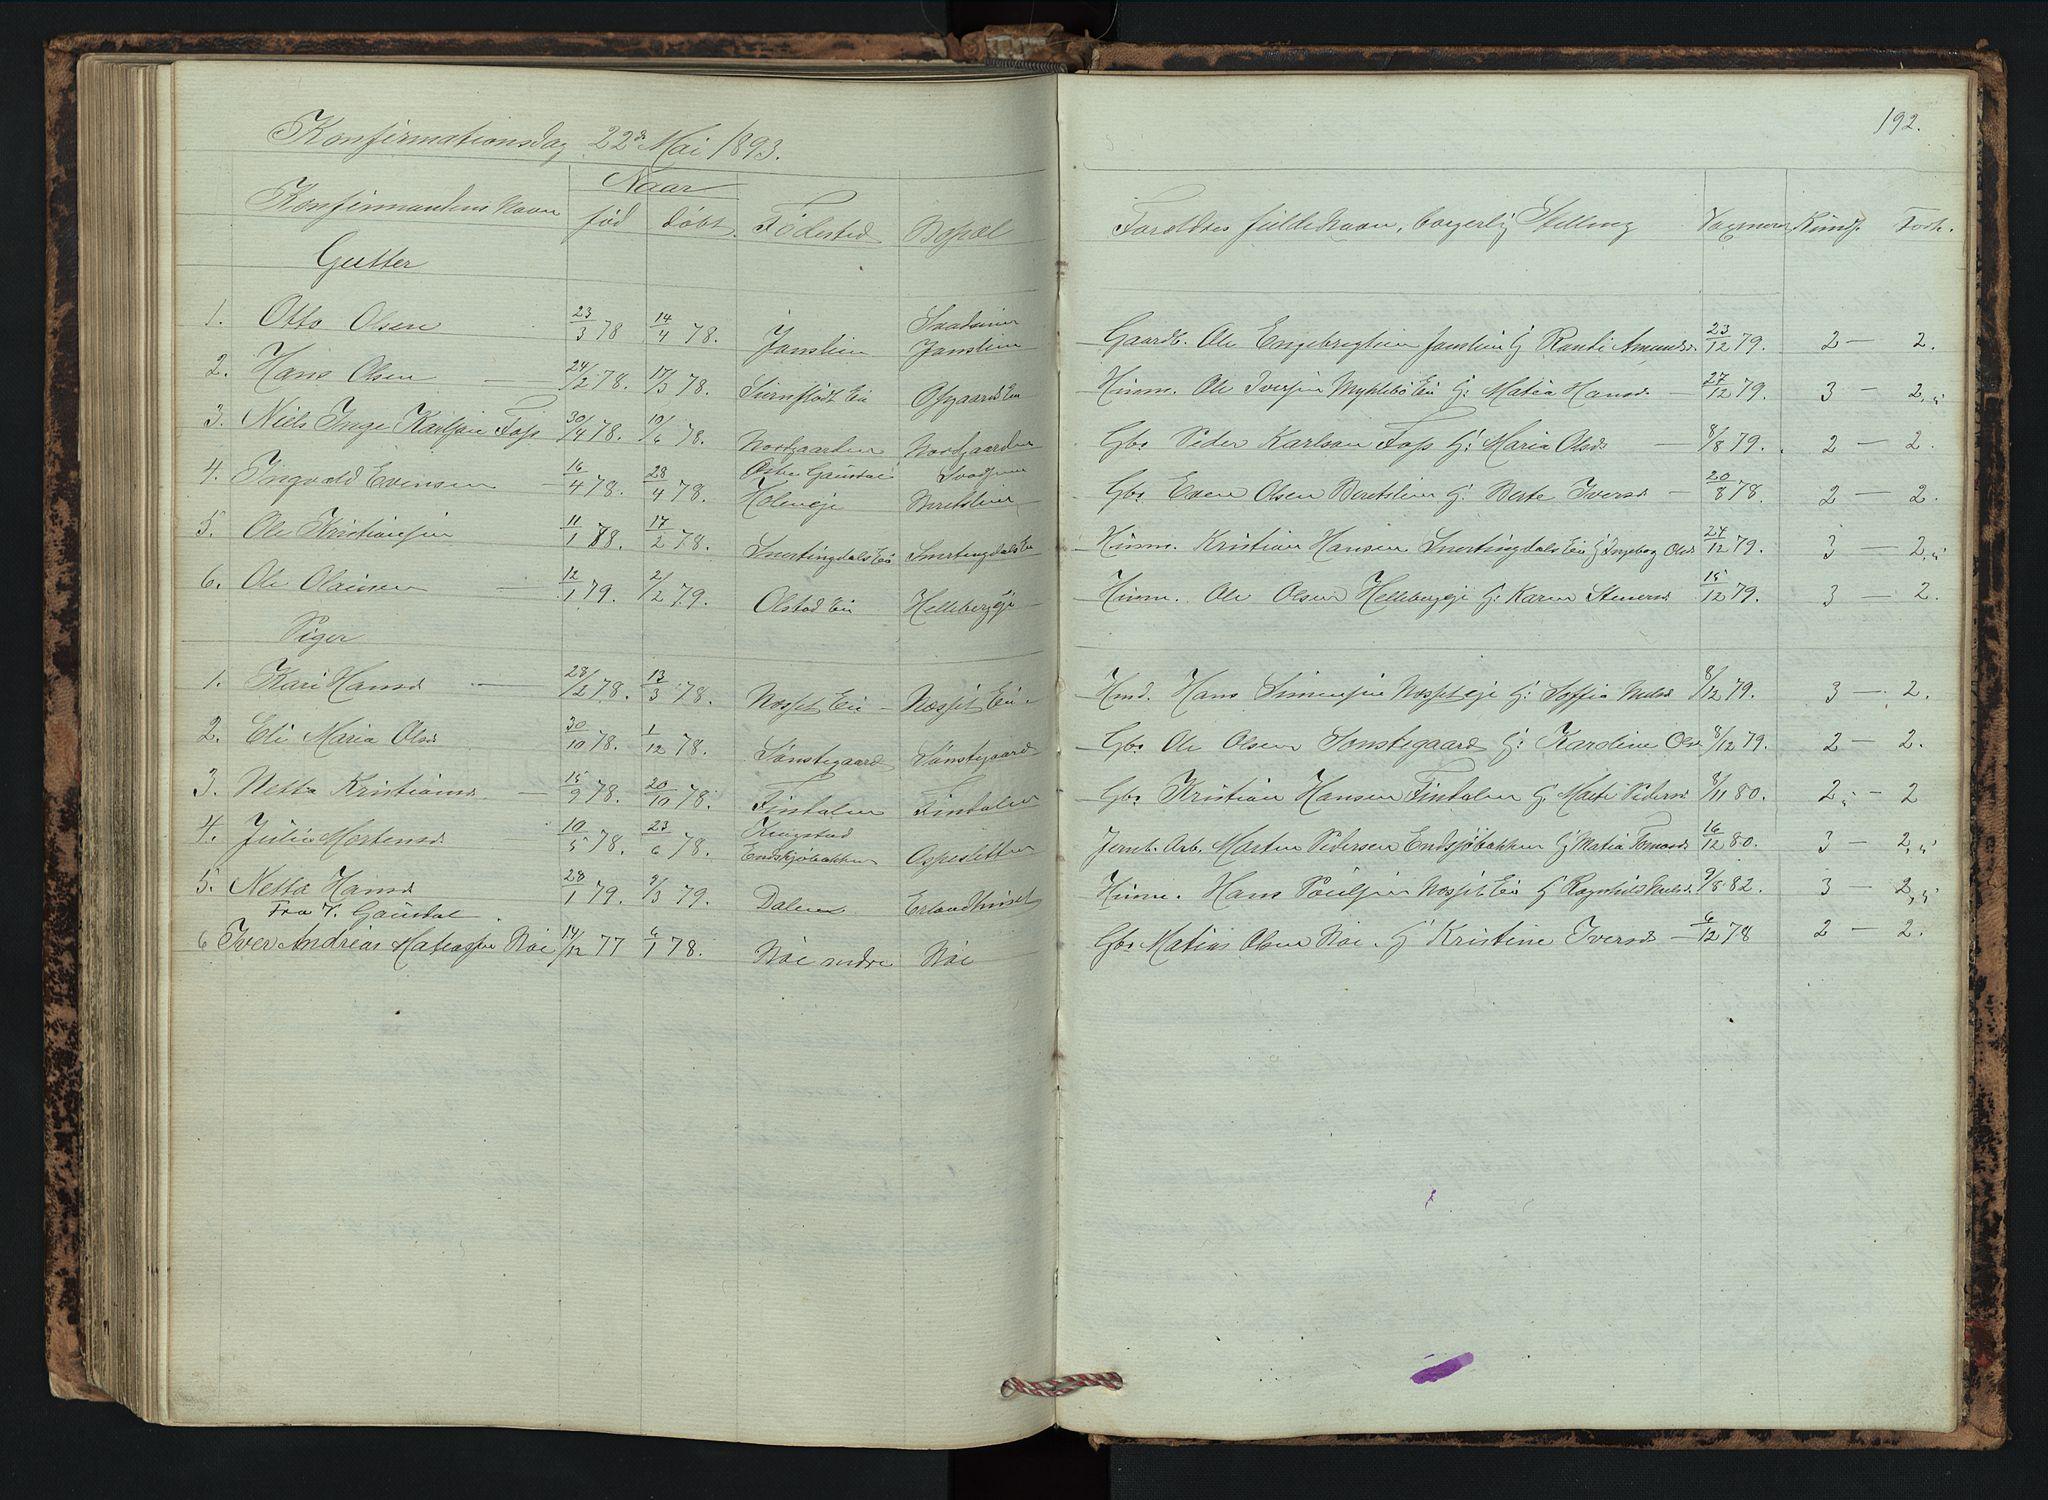 SAH, Vestre Gausdal prestekontor, Klokkerbok nr. 2, 1874-1897, s. 192